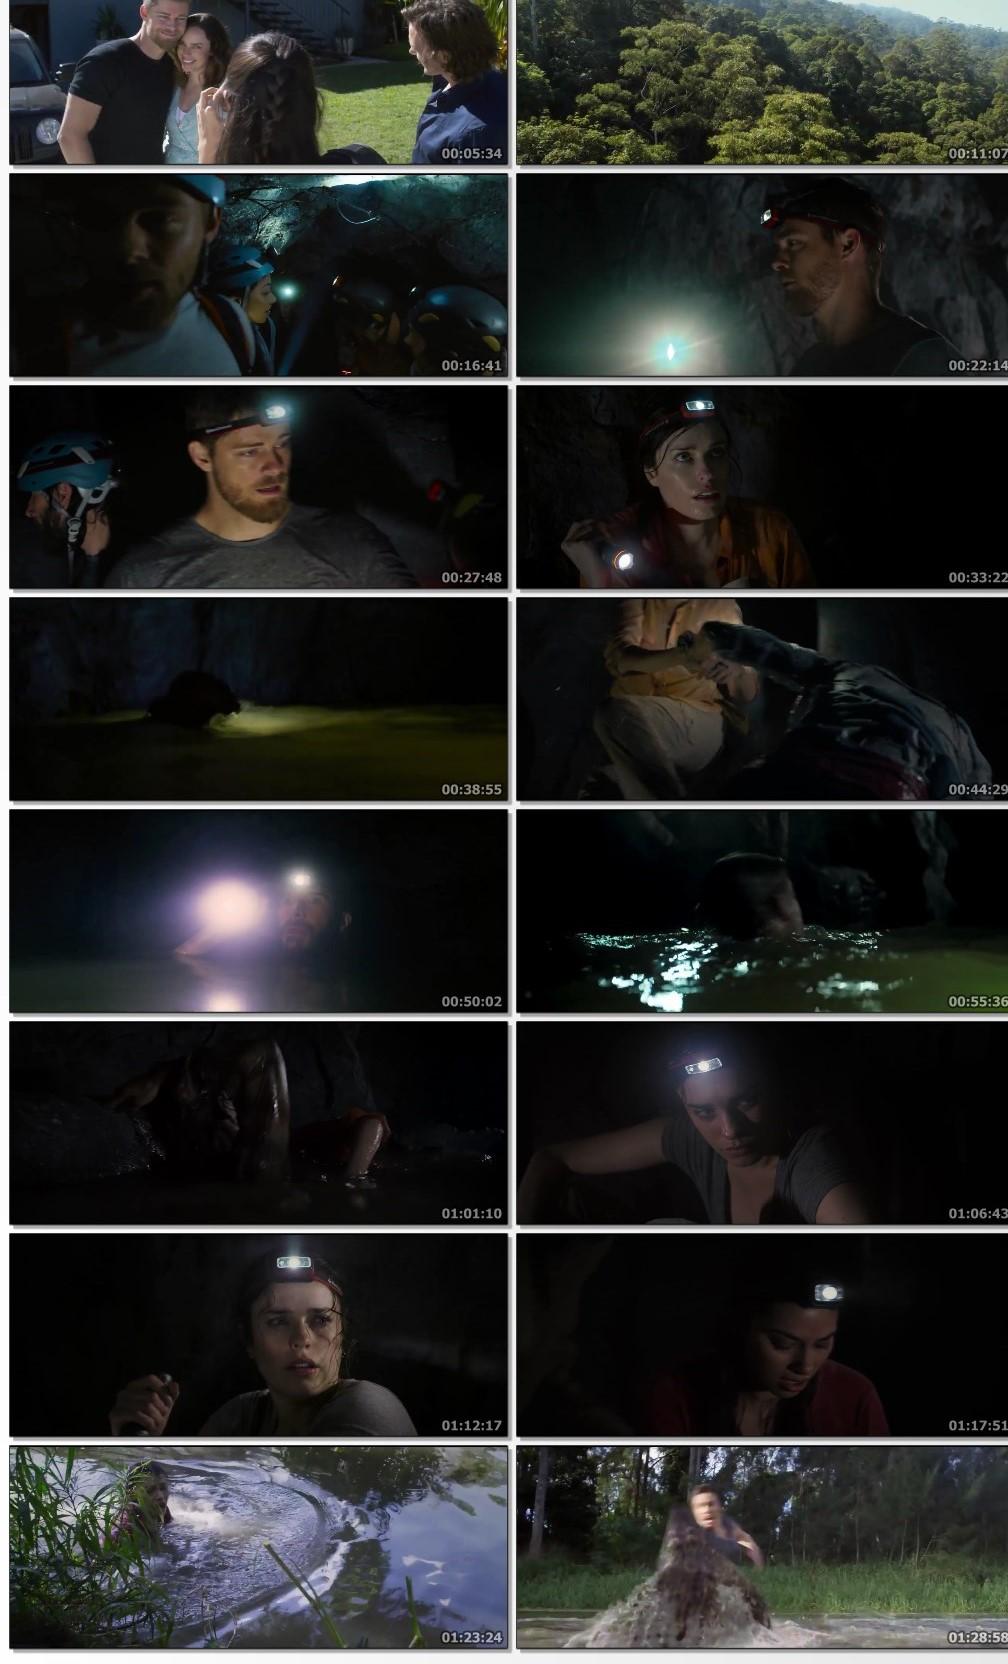 Black-Water-Abyss-2020-Hindi-ORG-Dual-Audio-www-9kmovies-work-720p-AMZN-HDRip-ESub-700-MB-mkv-thumbs